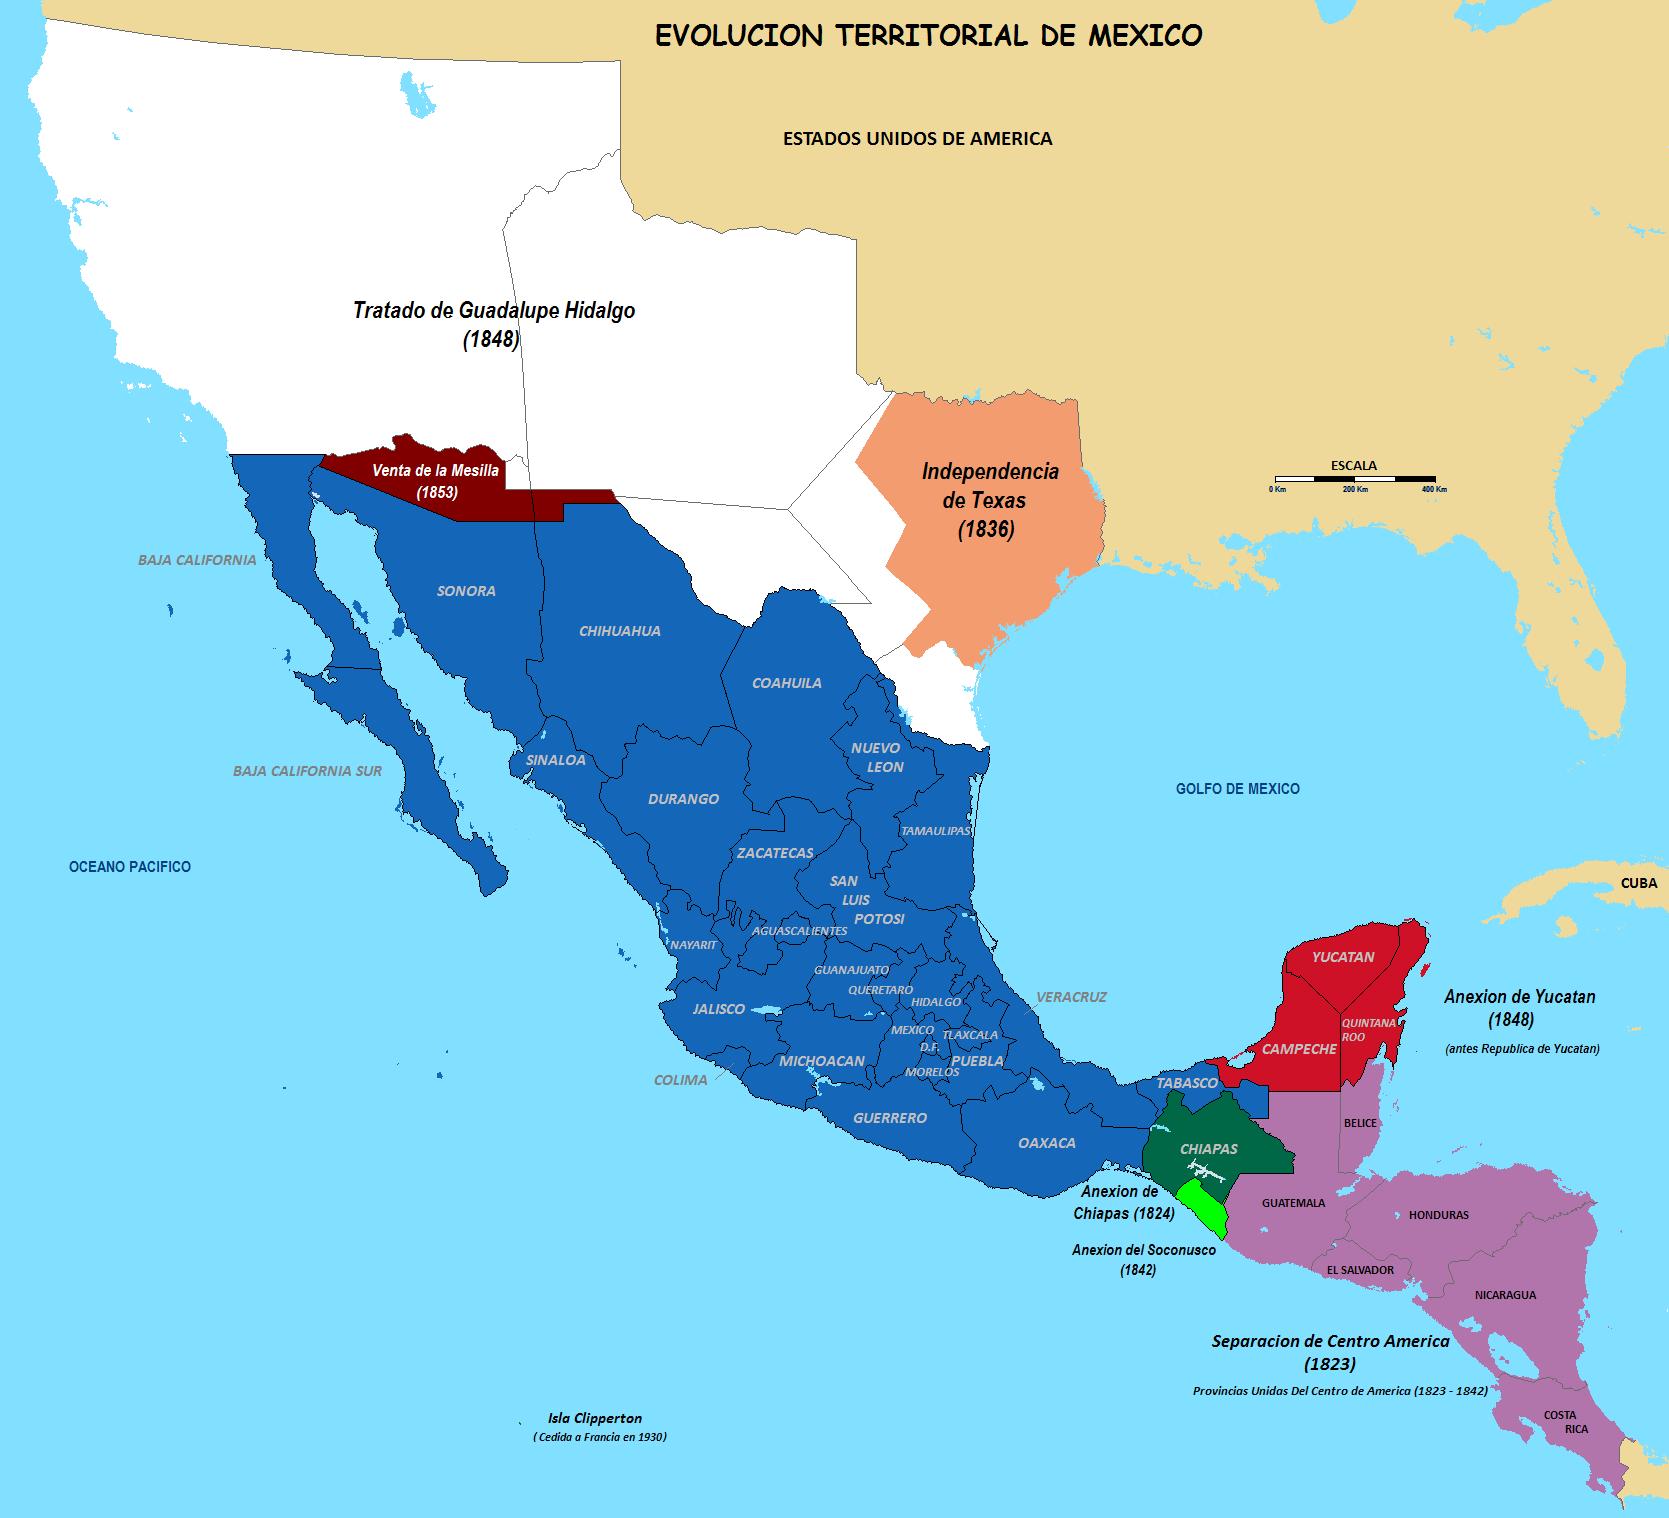 Evolucion_Territorial_de_Mexico-1